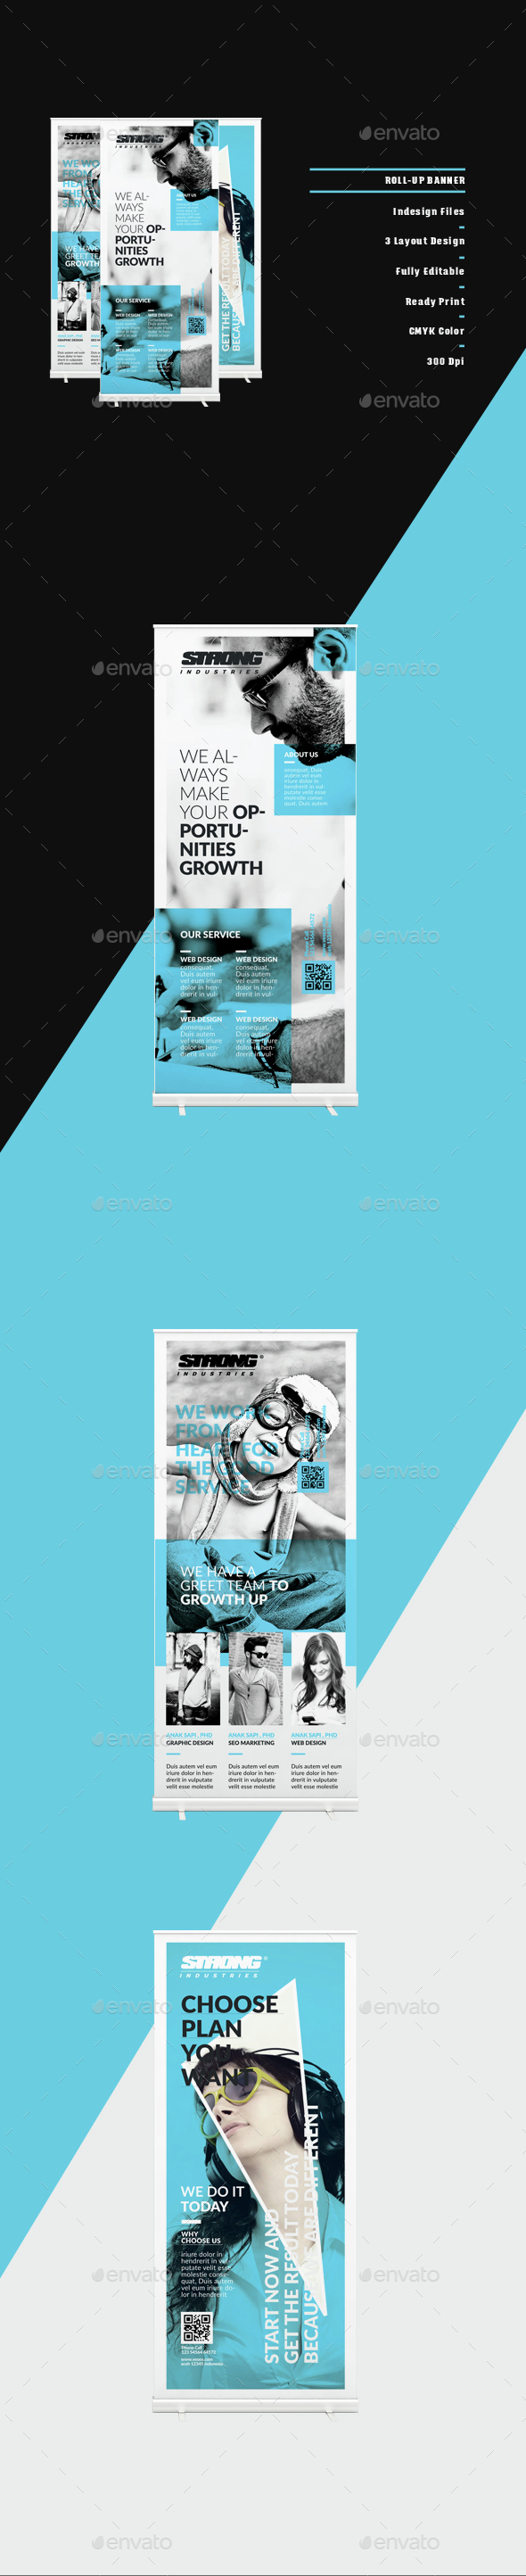 Banner - Signage Print Templates